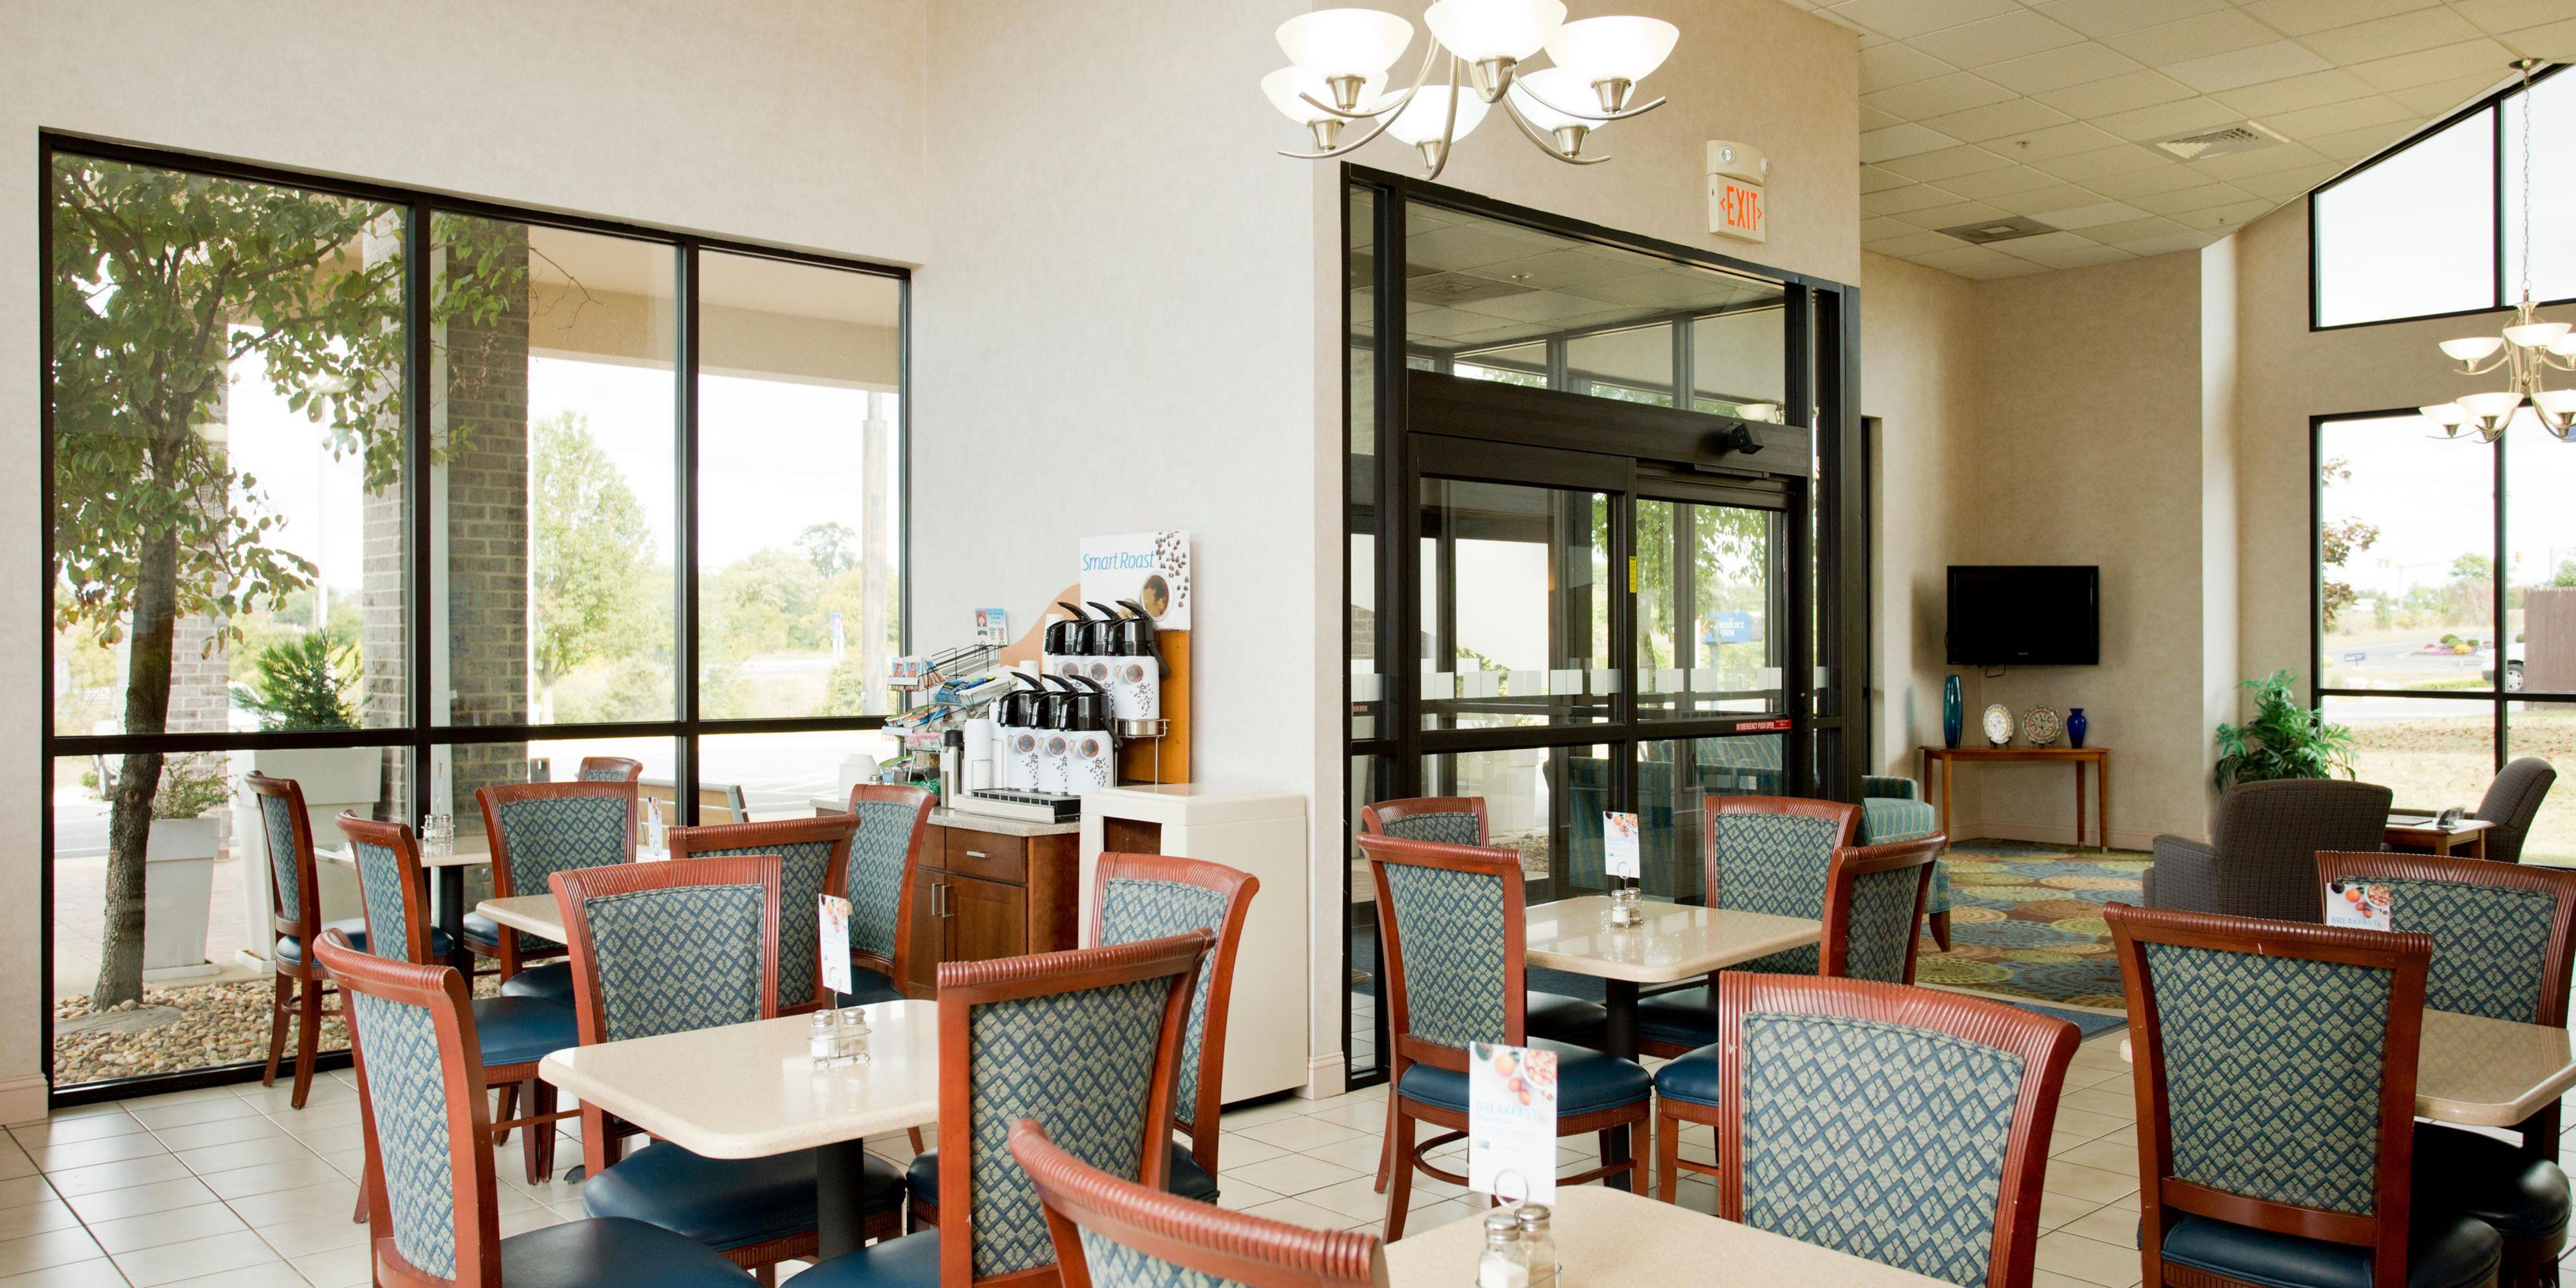 Holiday Inn Express Stephens City 3431668355 2x1